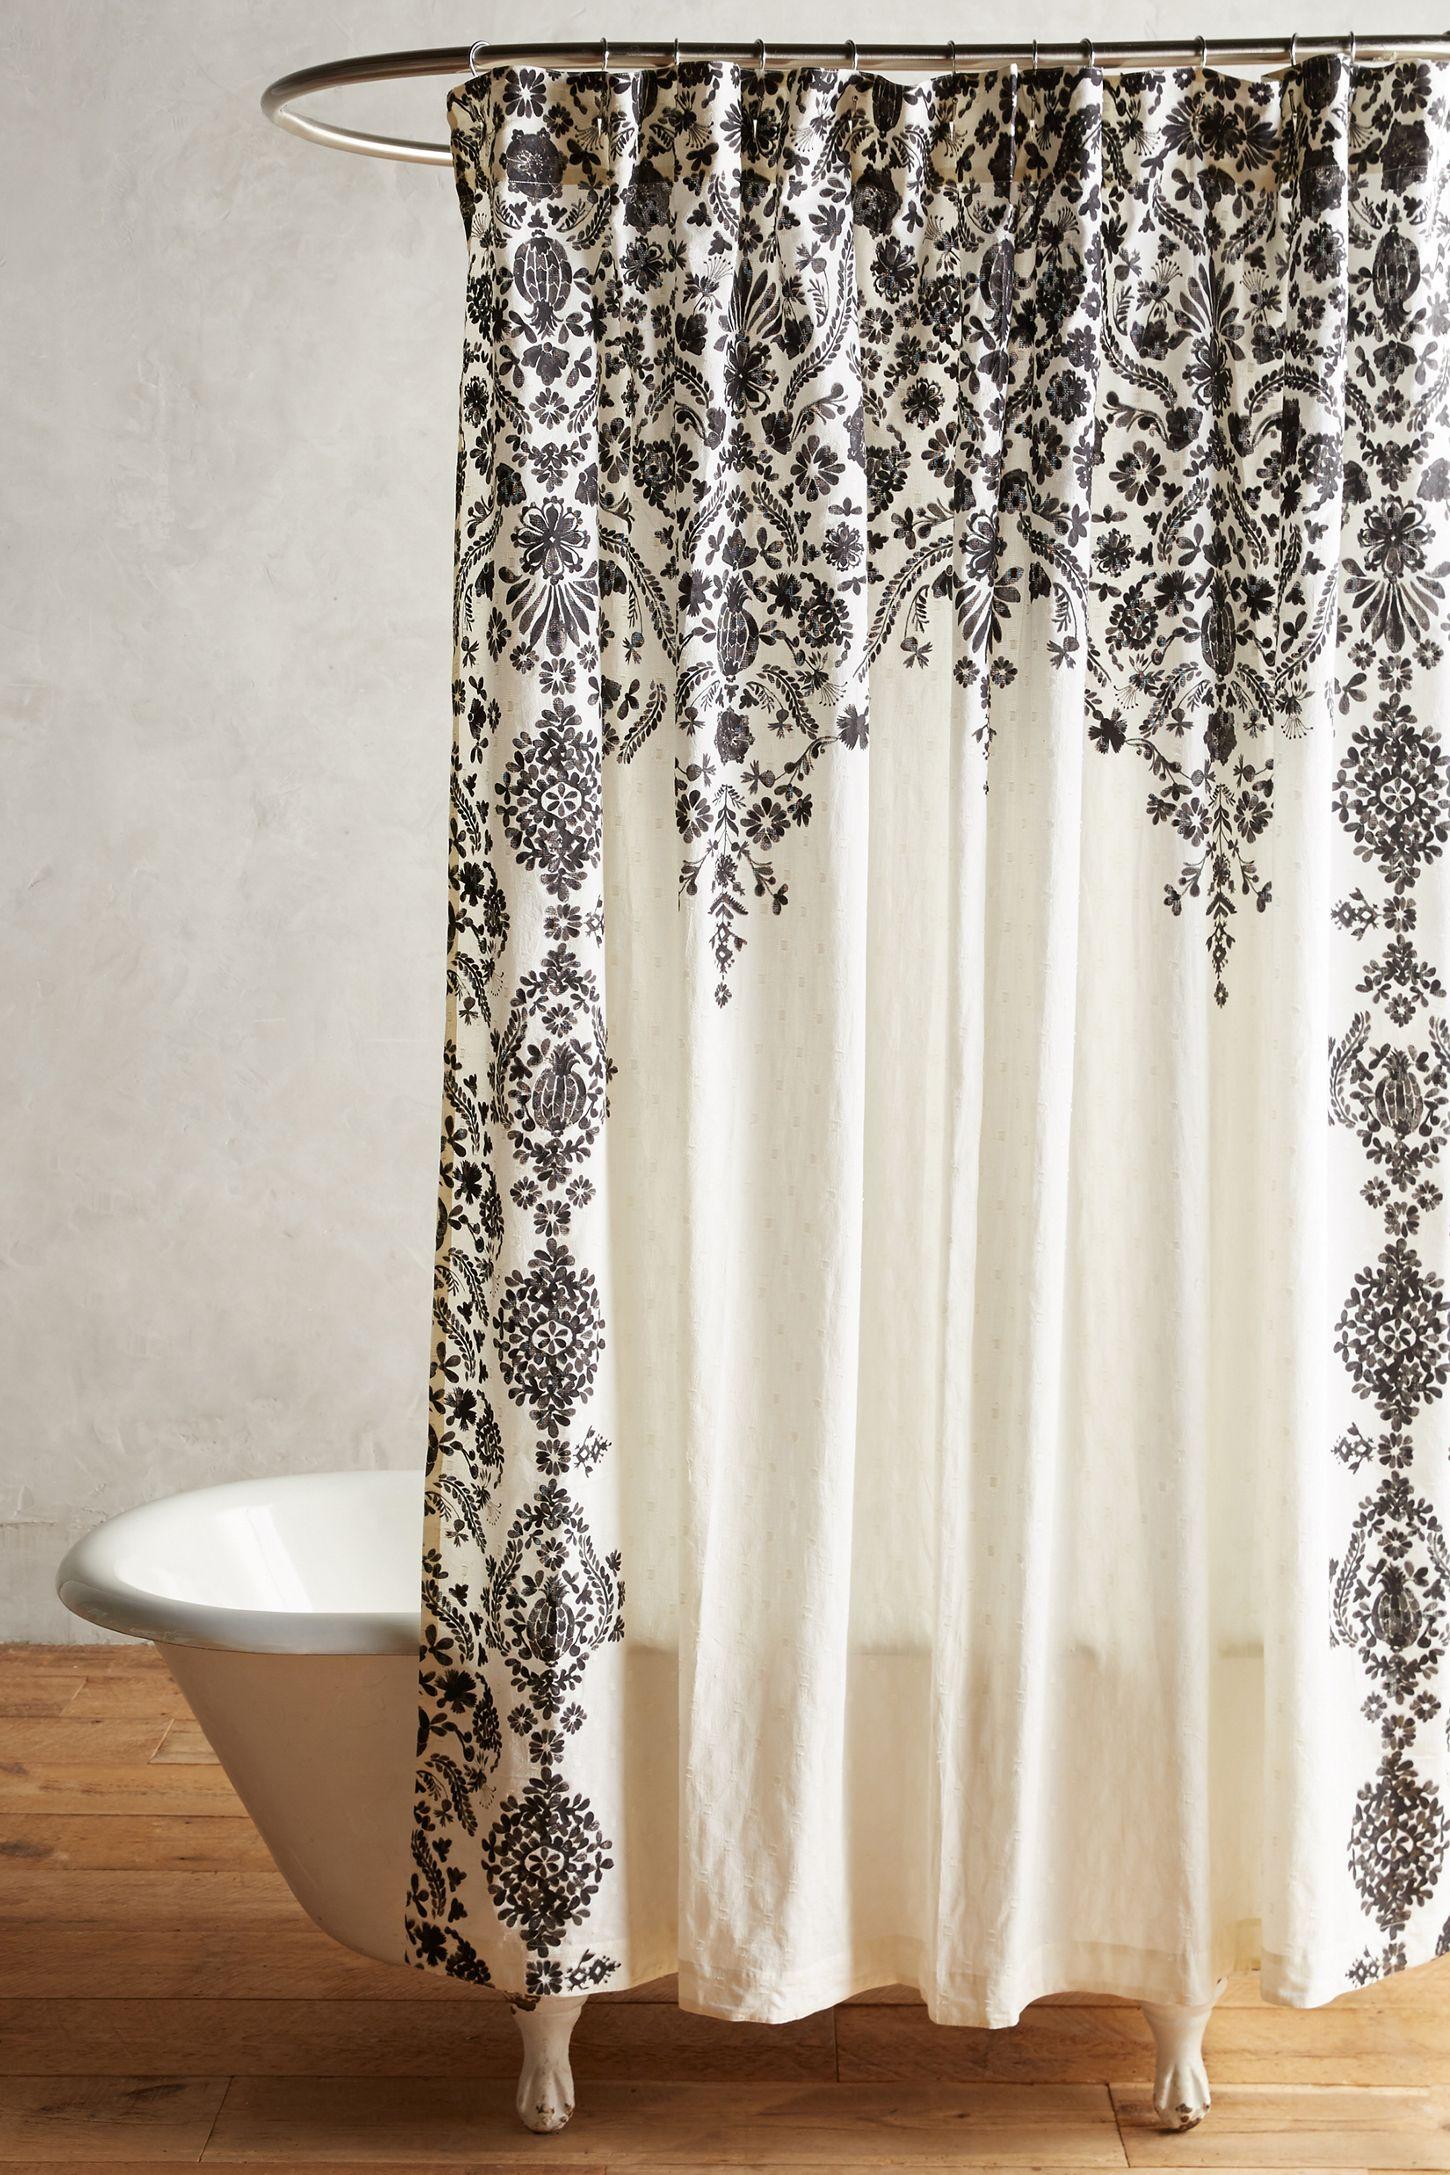 curtain rods dimensions longest bedroom monogram monogrammed shower kohls white crate rod and barrel curtains x regarding